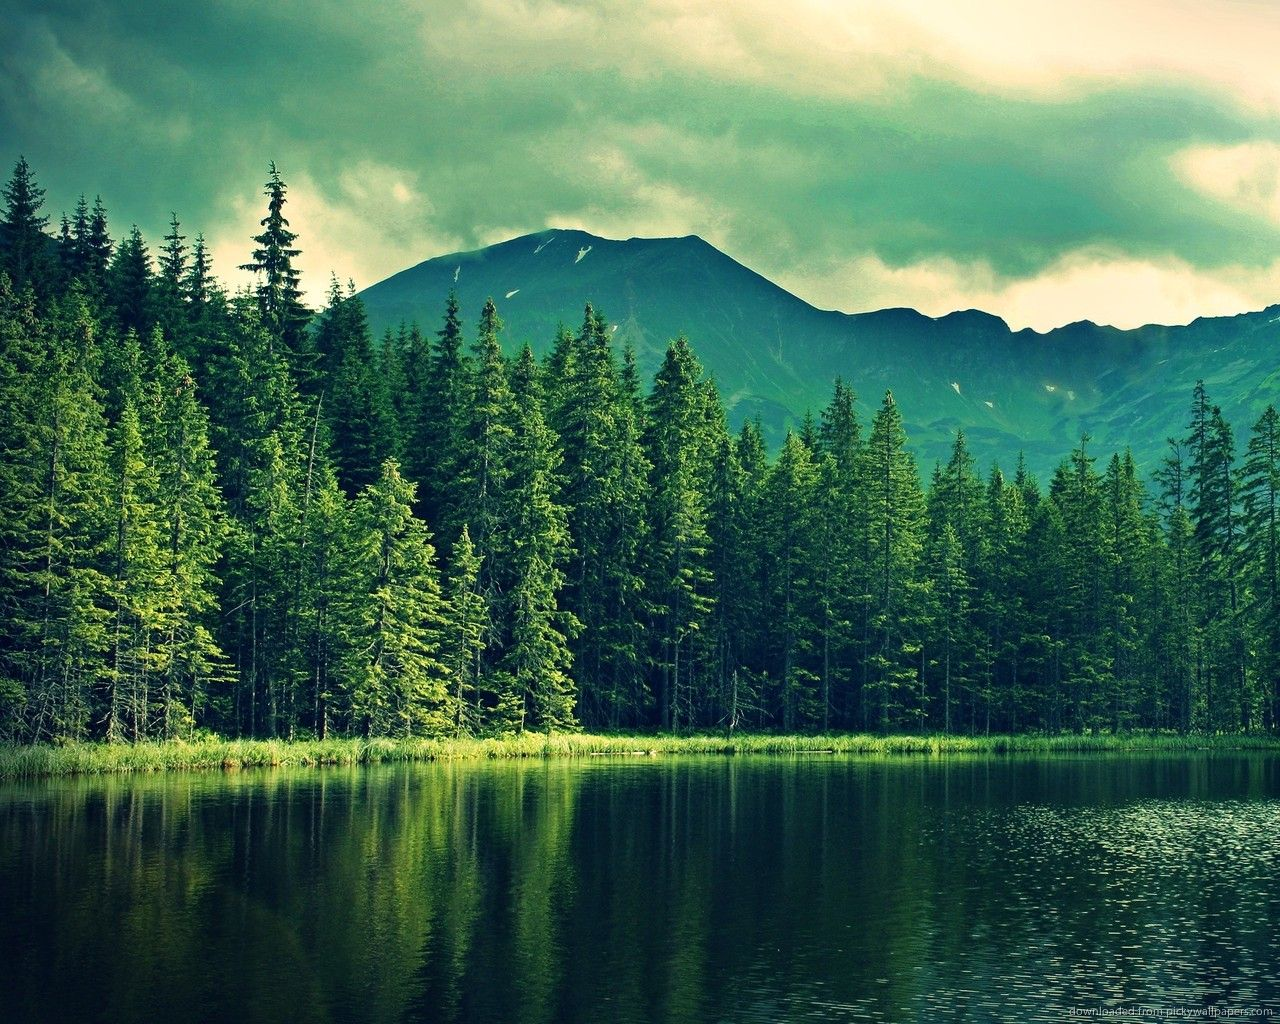 Pin By Teena Sauvola On Art Photography Mountain Landscape Landscape Background Scenery Wallpaper green lake boat mountain fog